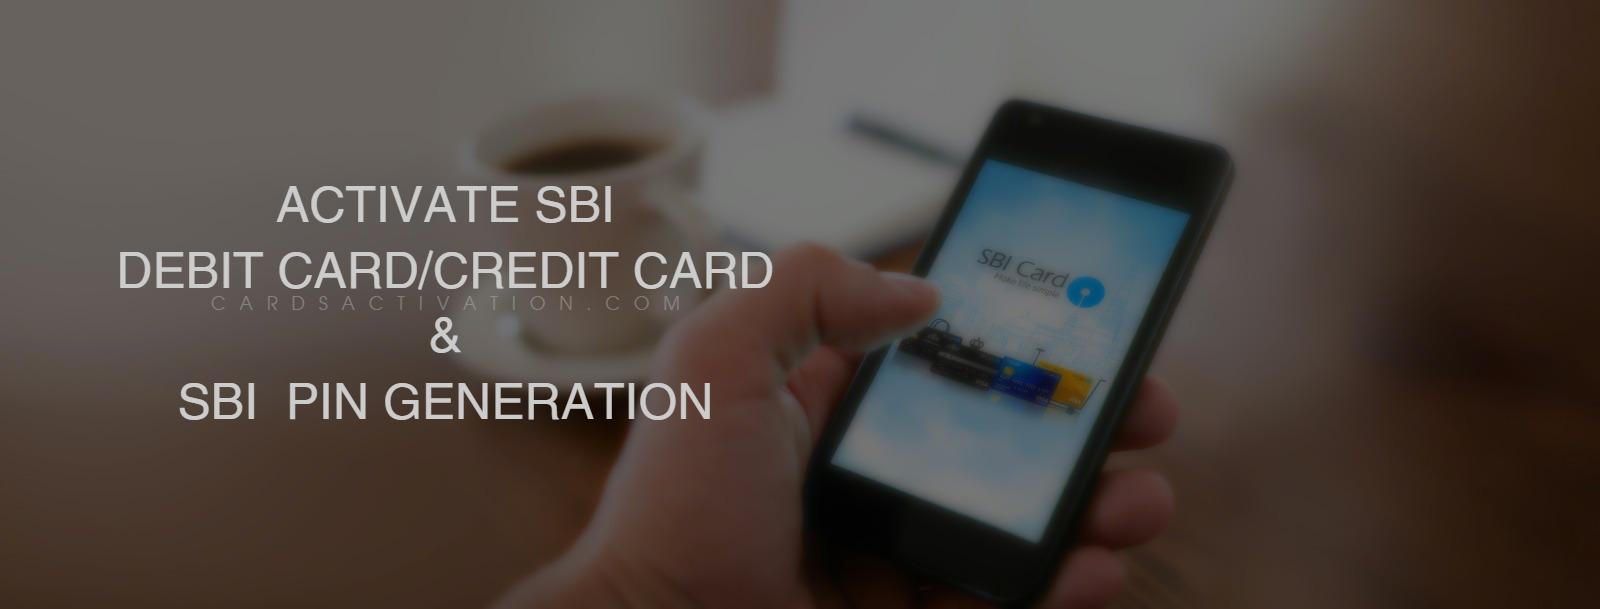 SBI Card PIN Generation | Activate SBI Credit Card